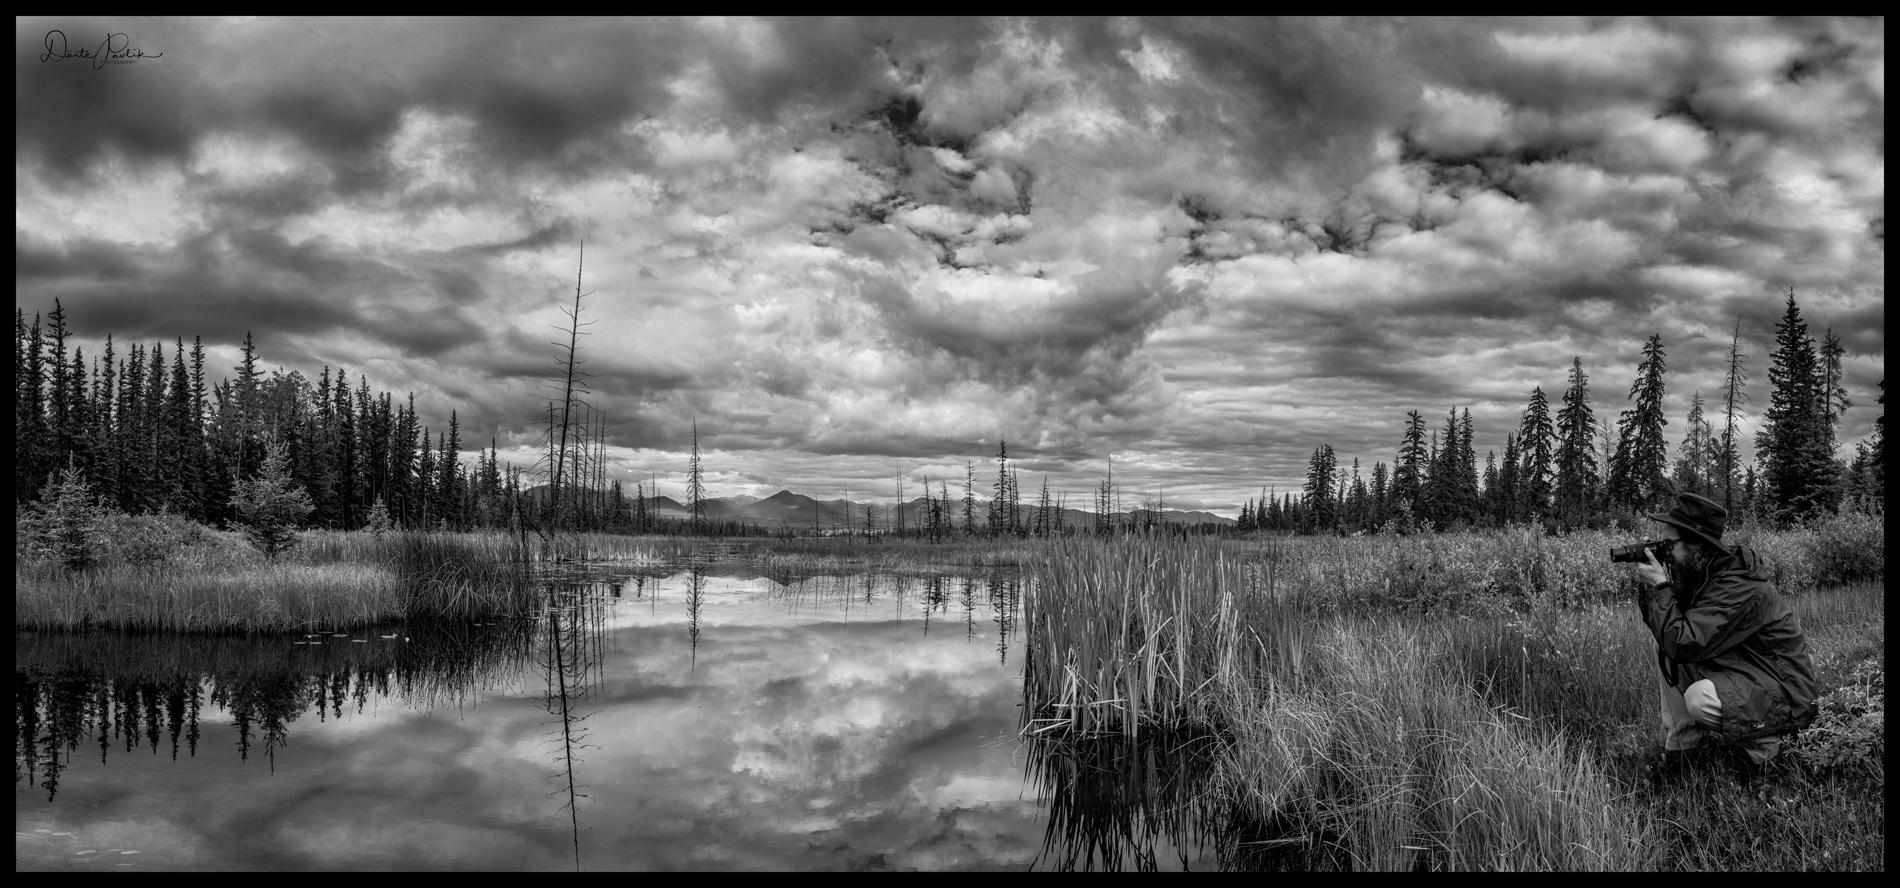 A Photographer's Delight - Near Meadow Lake - Doerte Pavlik